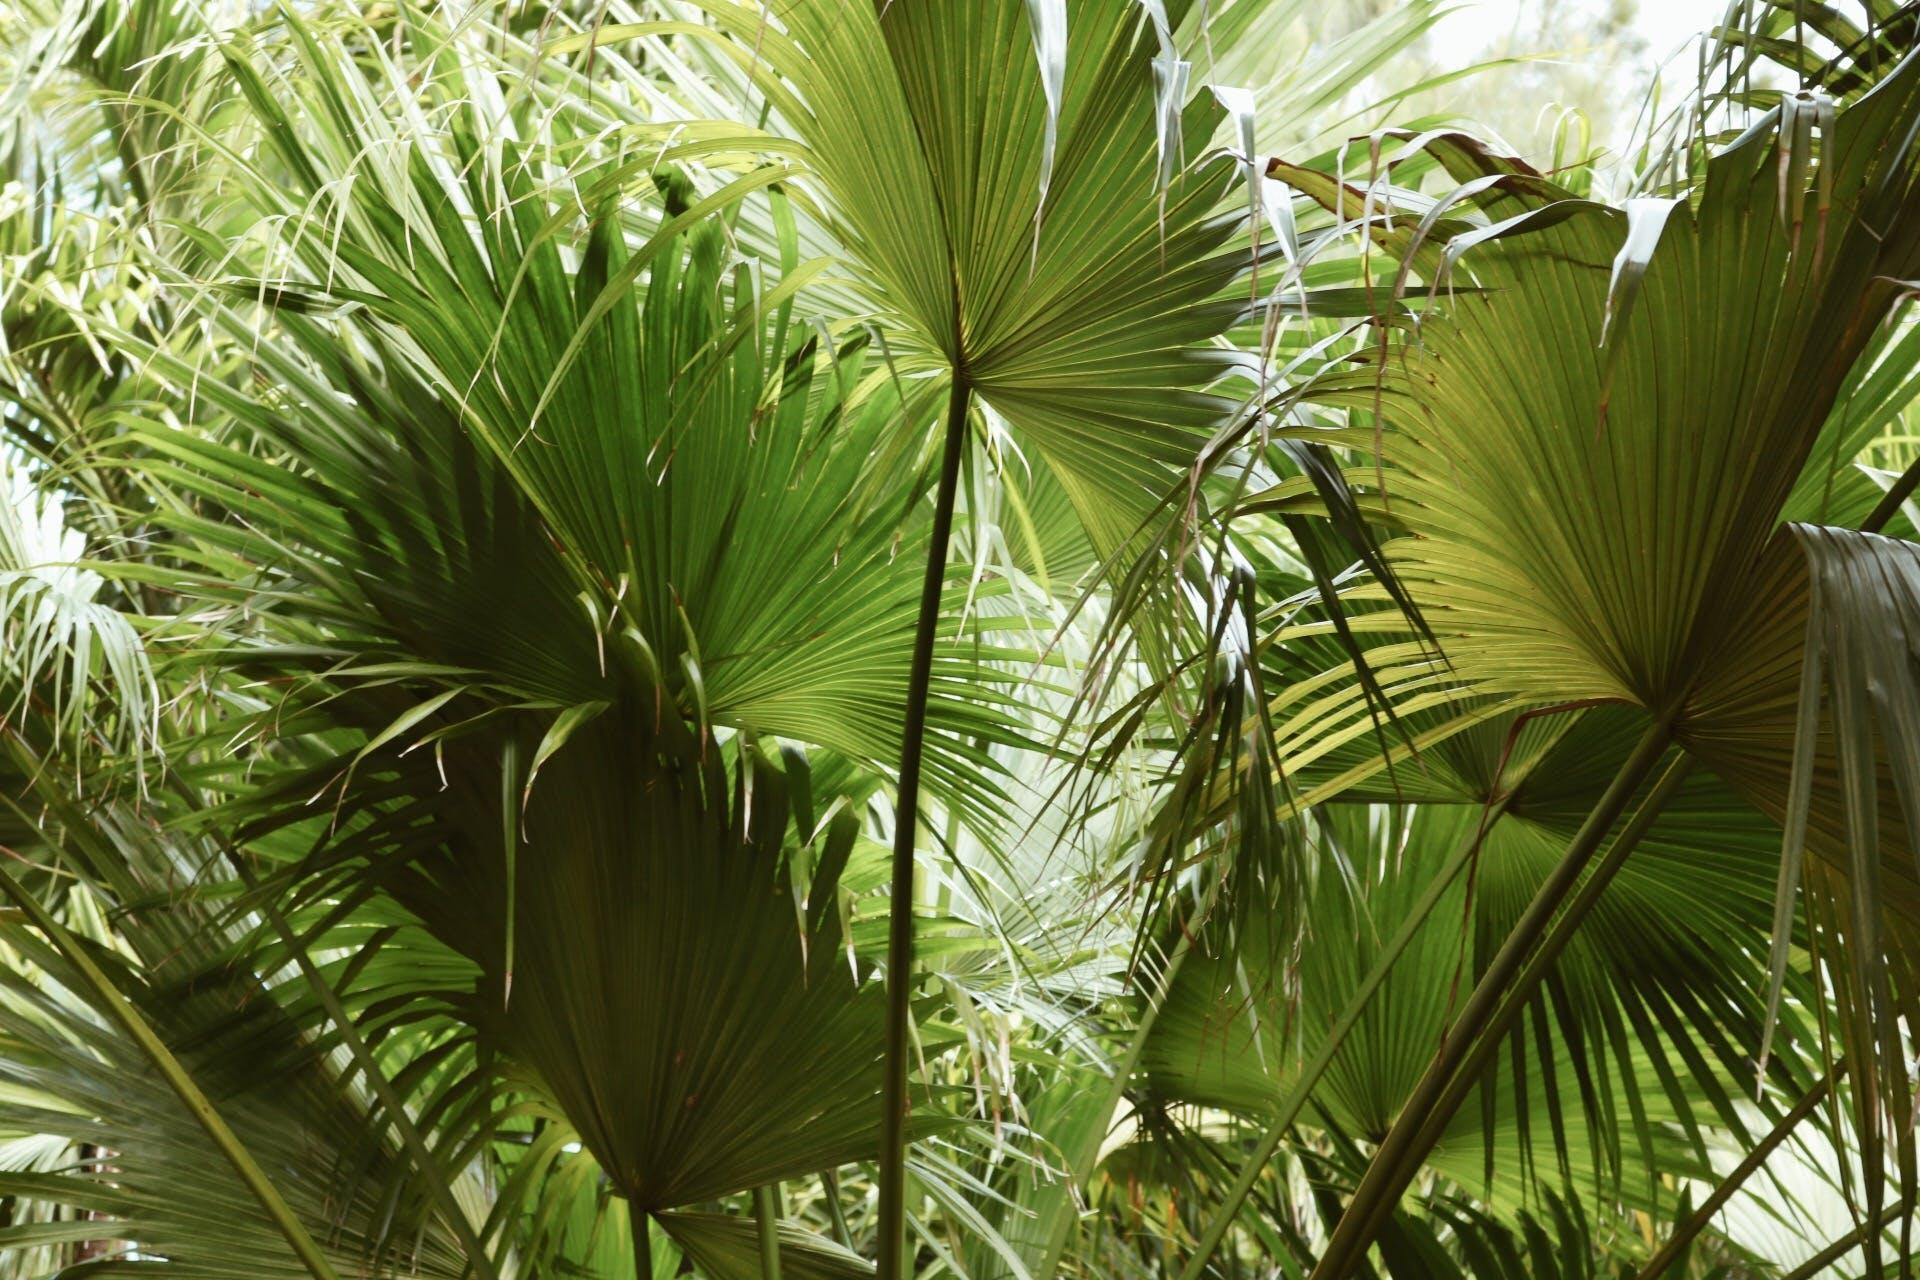 Green Fan Leaf Plant